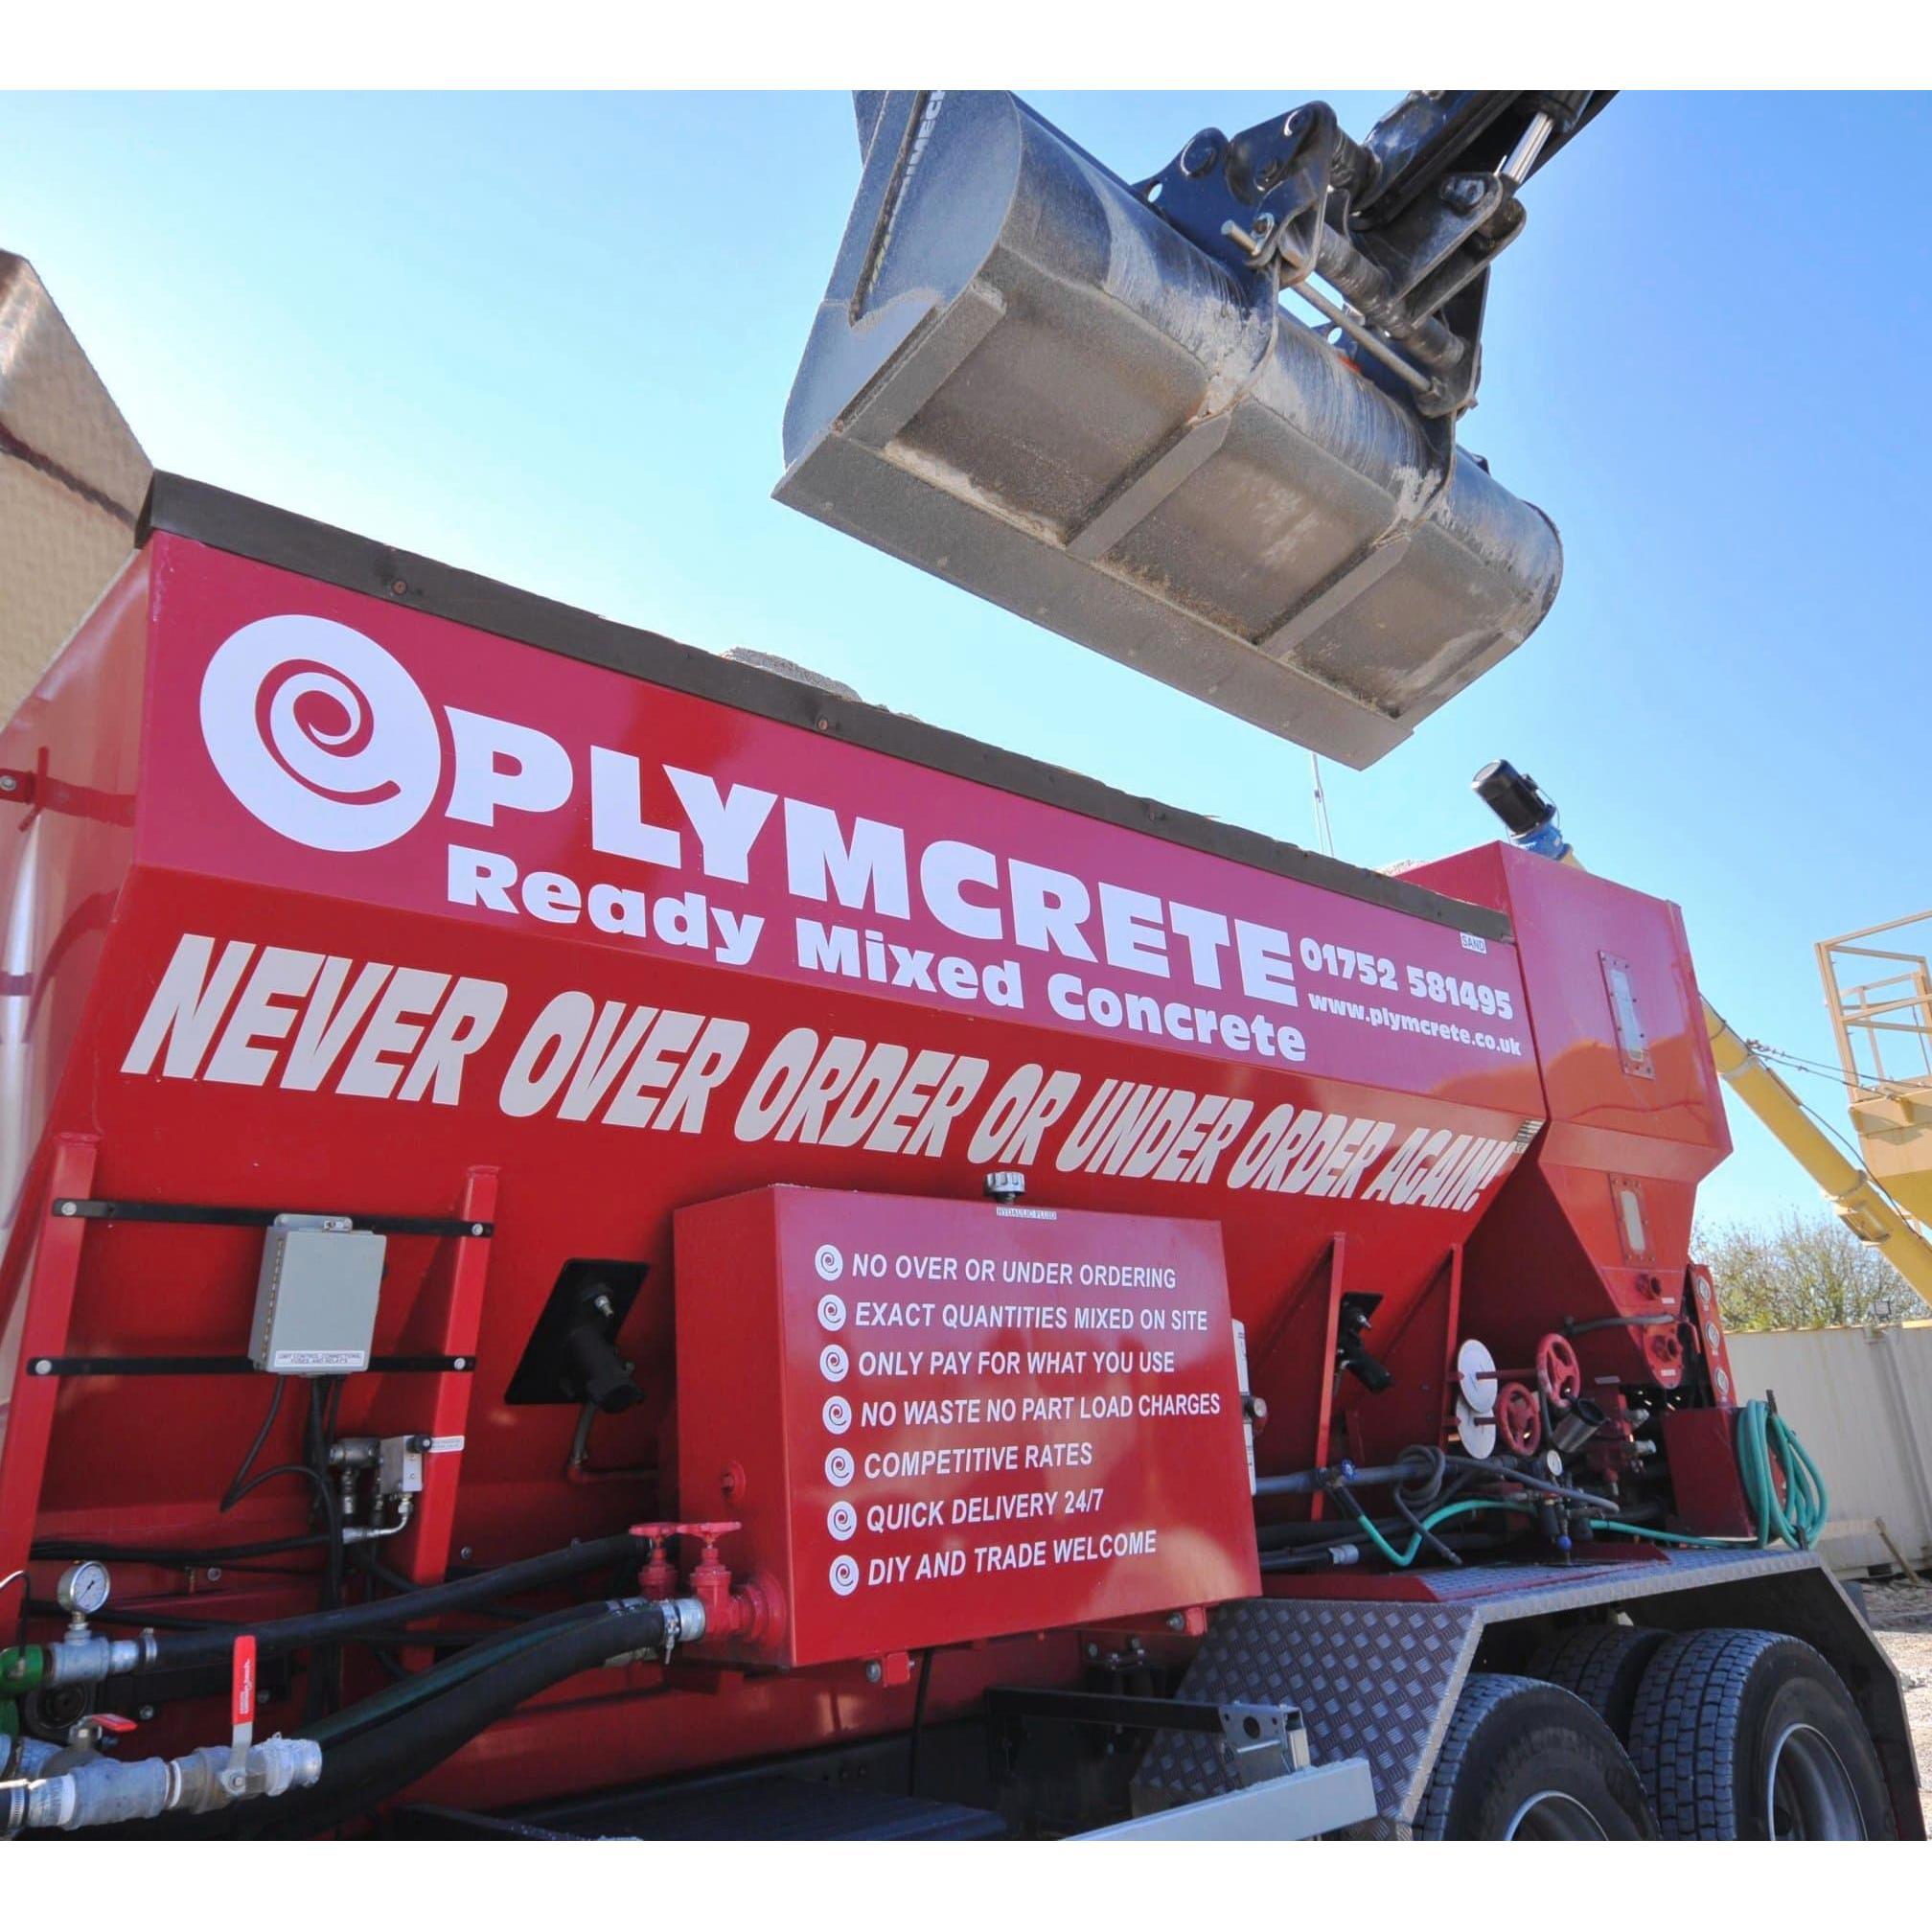 Plymcrete Southwest Ltd - Plymouth, Devon PL6 7PP - 01752 581495 | ShowMeLocal.com